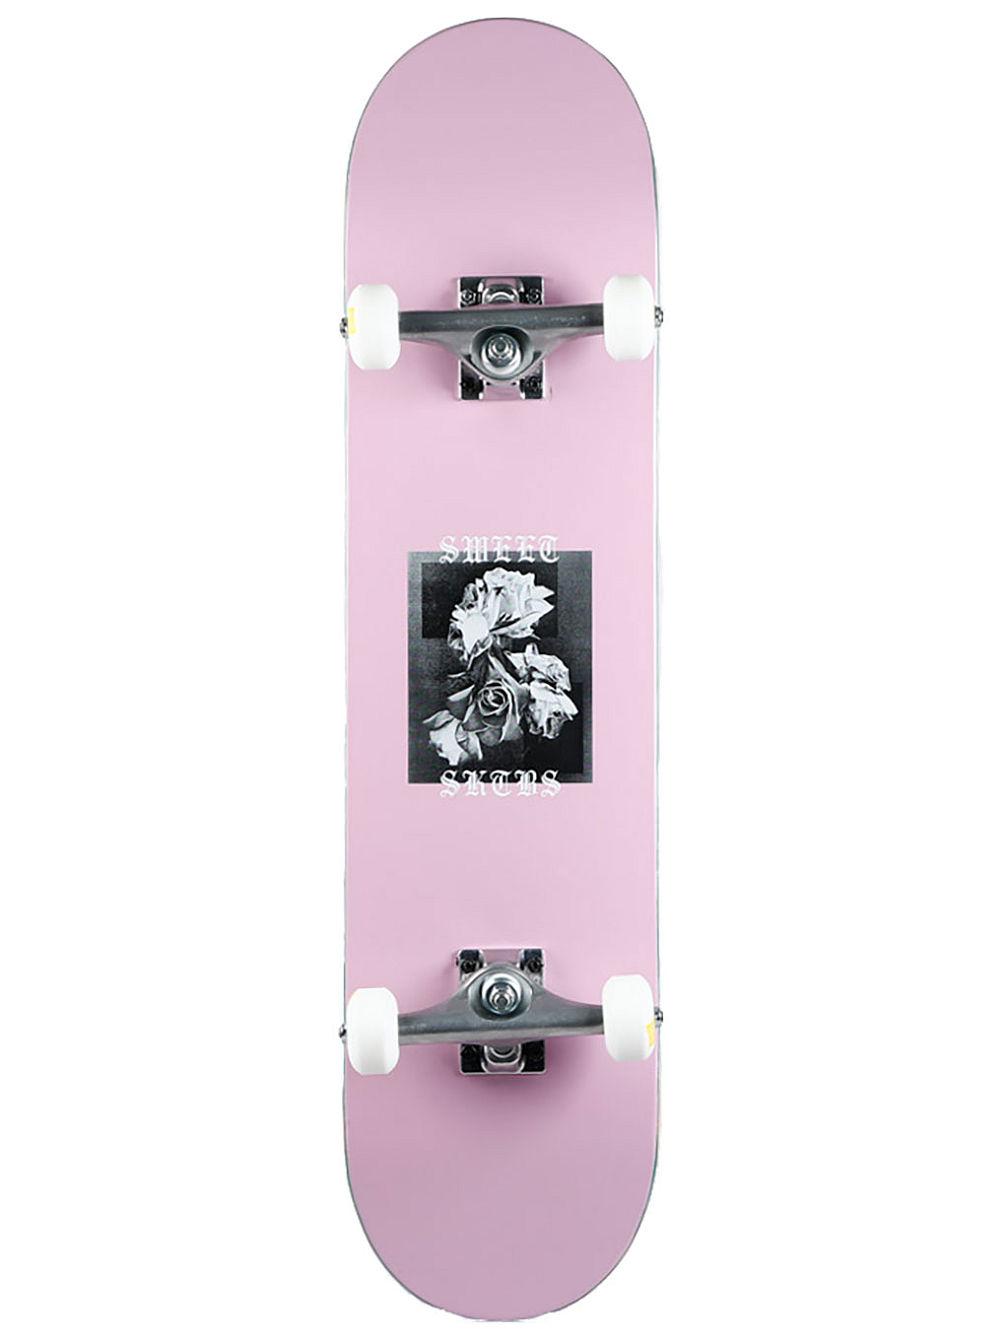 Osta SWEET SKTBS Rose Pink 7.75